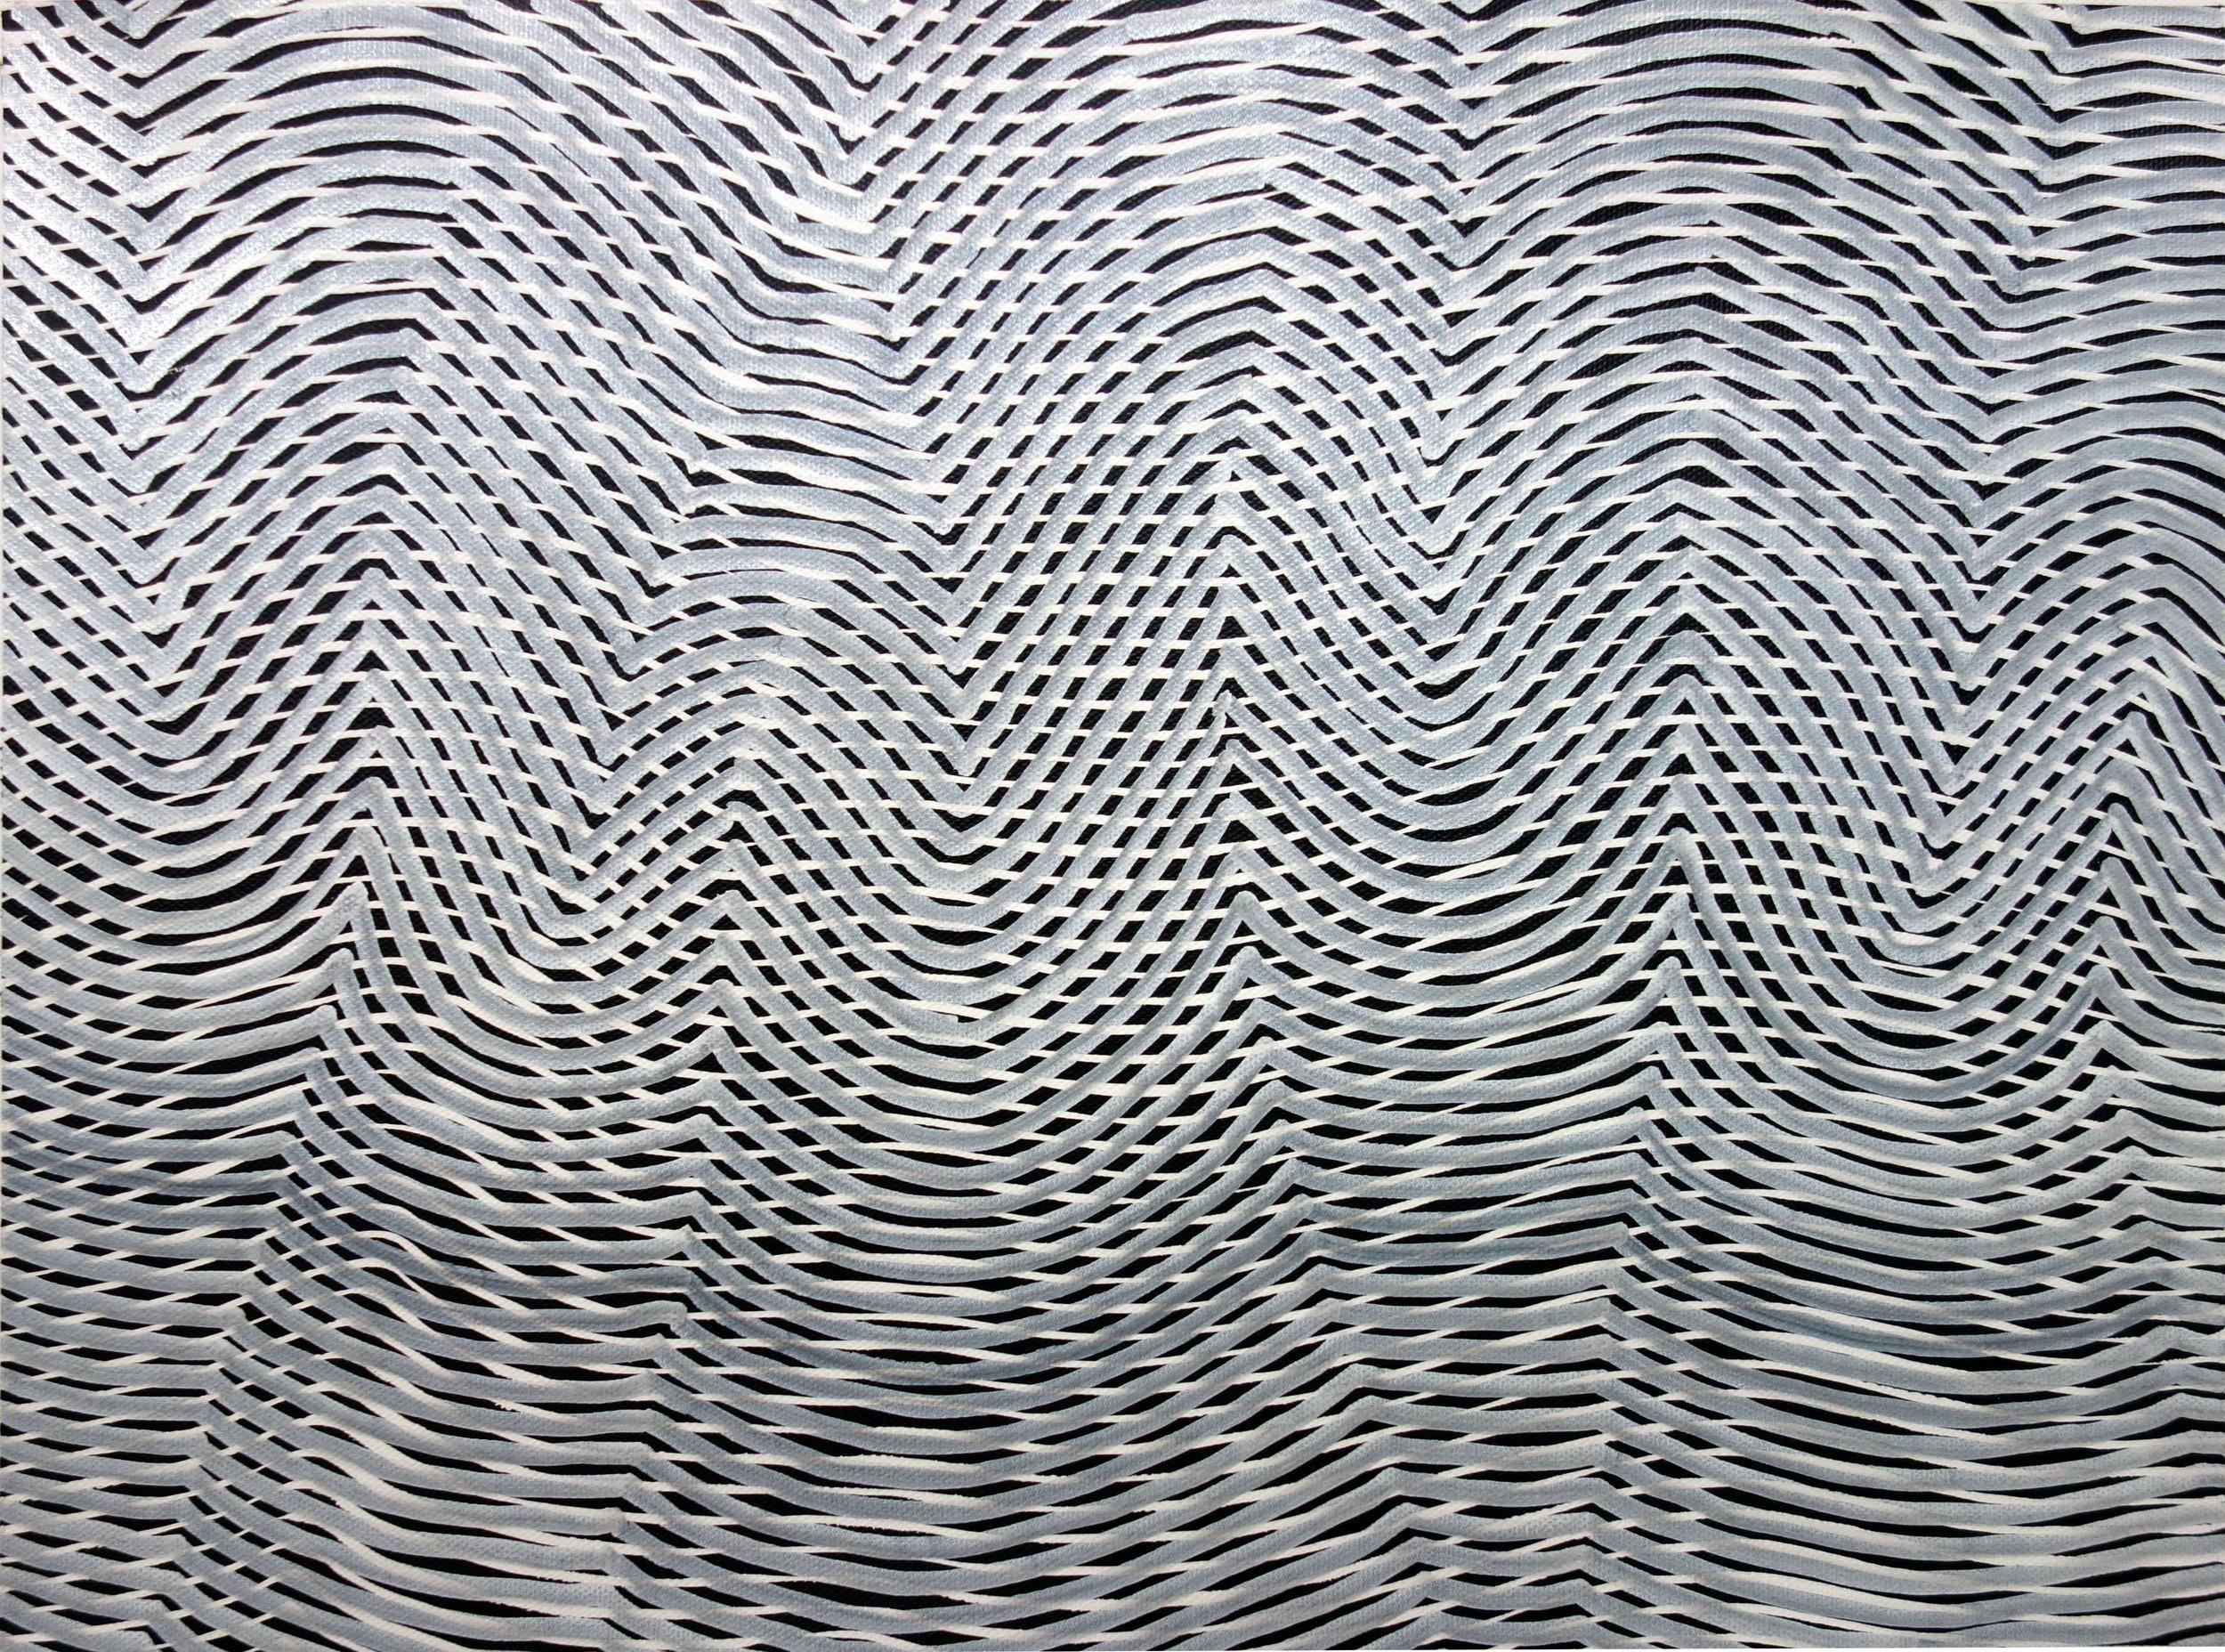 Lines 92  Varnish on Canvas  30cm x 40cm sold